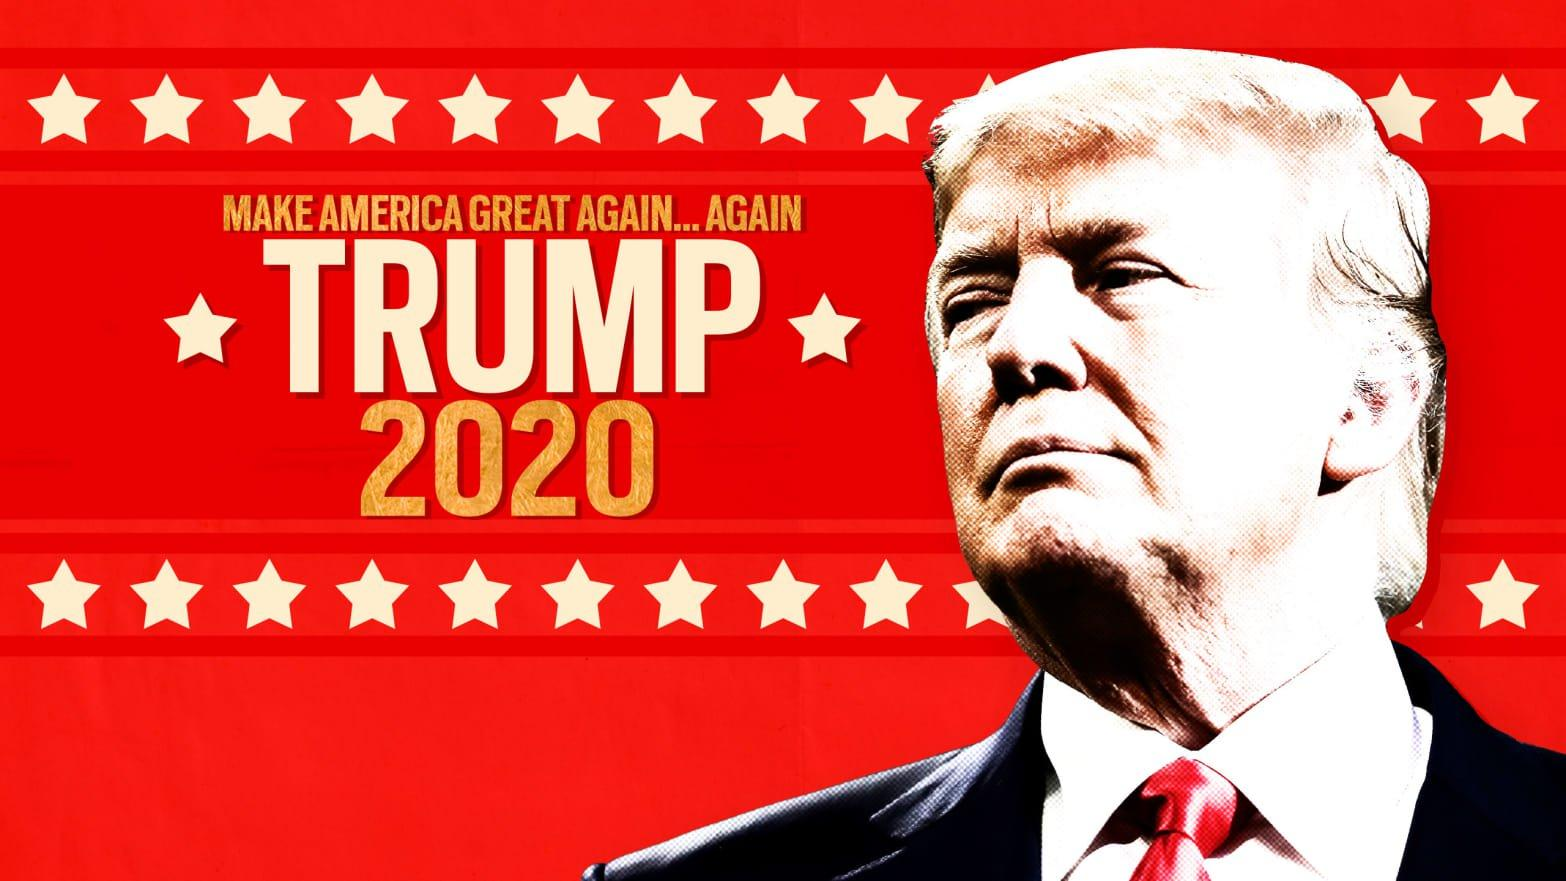 Hd Wallpaper Donald Trump The 45th President Of Usa Wallpaper Donald J Trump Wallpaper Flare